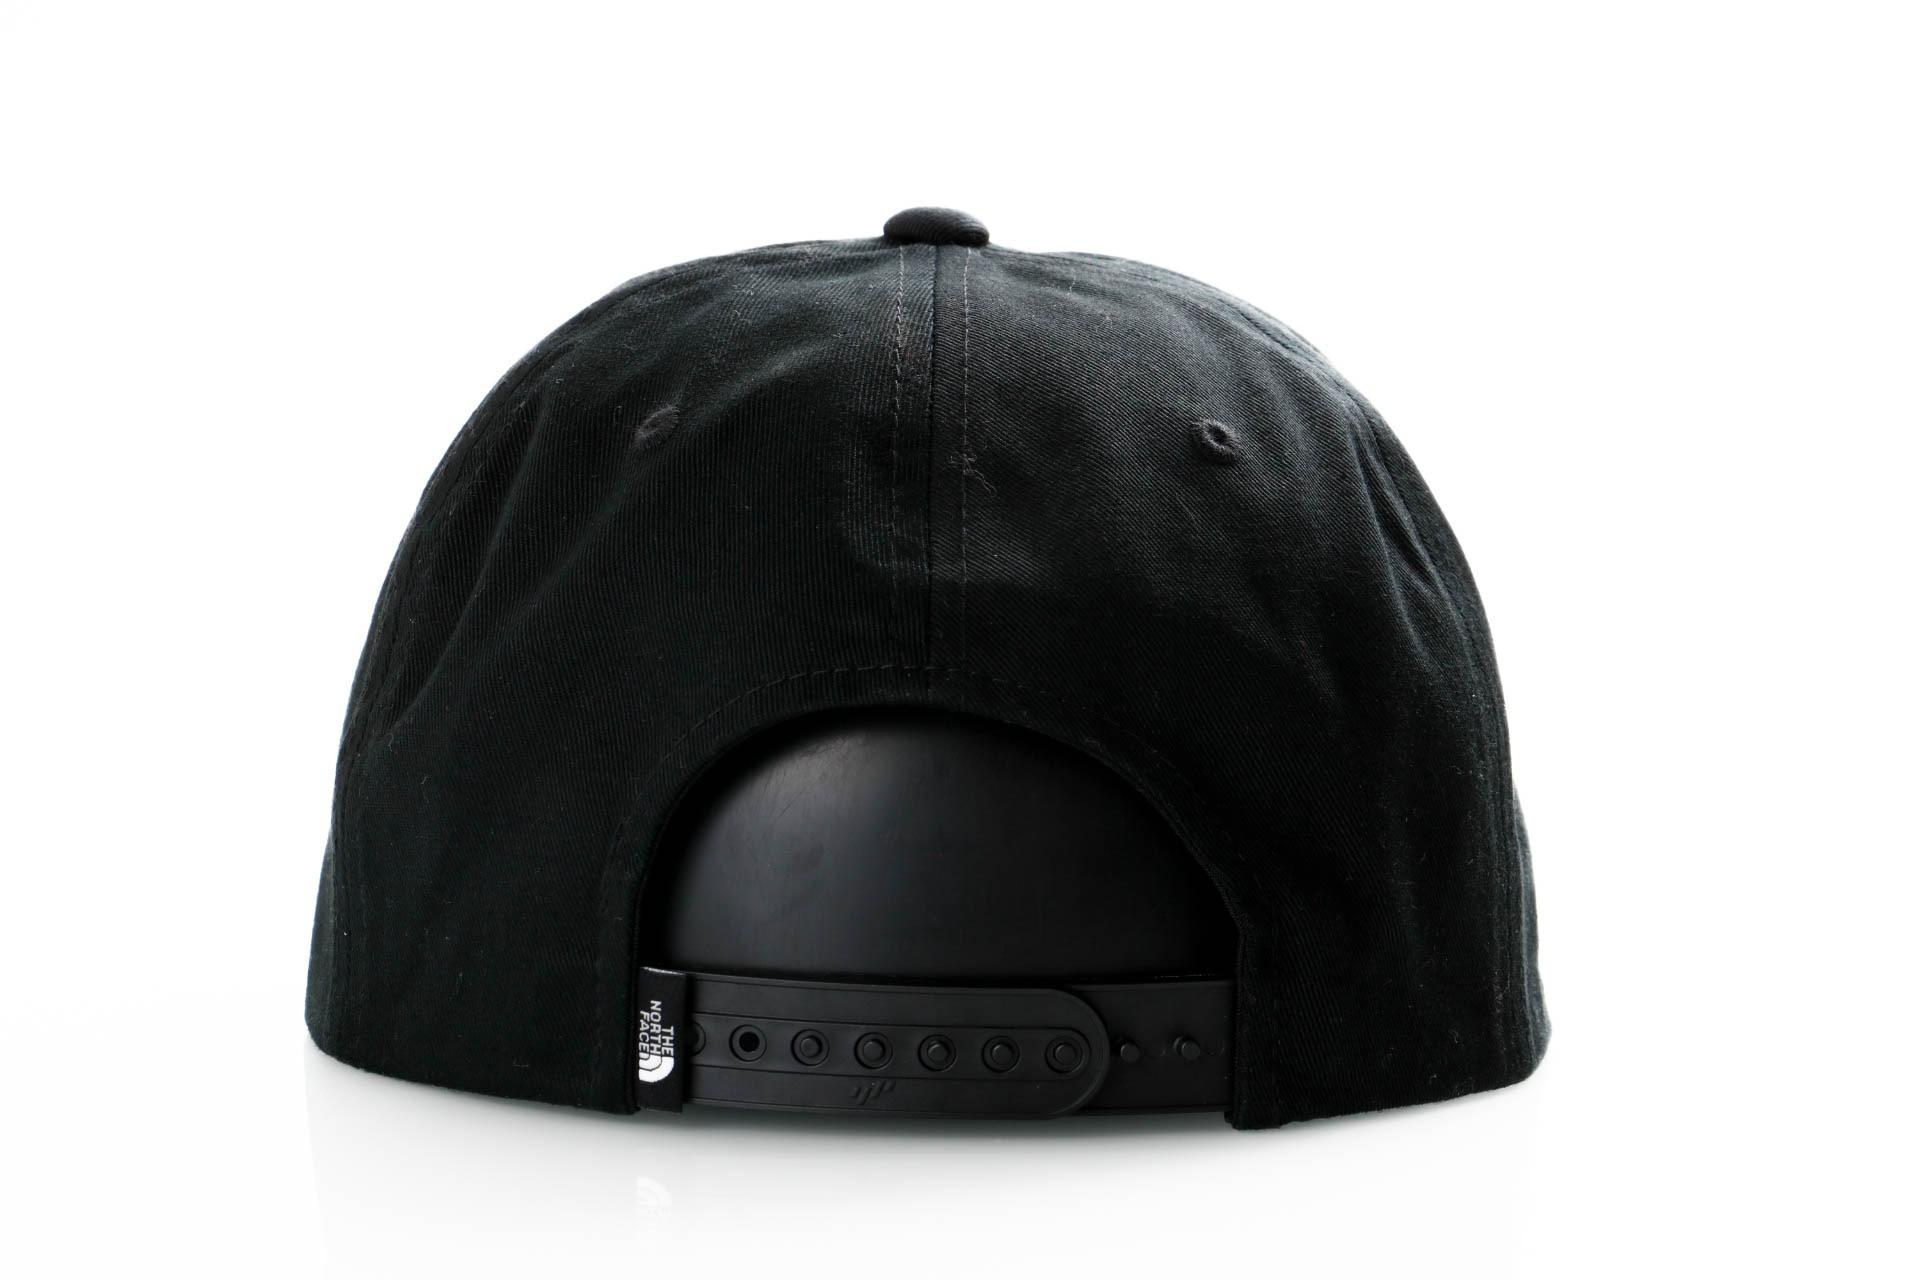 01460afe2db Afbeelding van The North Face Street Ball Cap T93FFKKX7 Snapback Tnf Black Tnf  Black